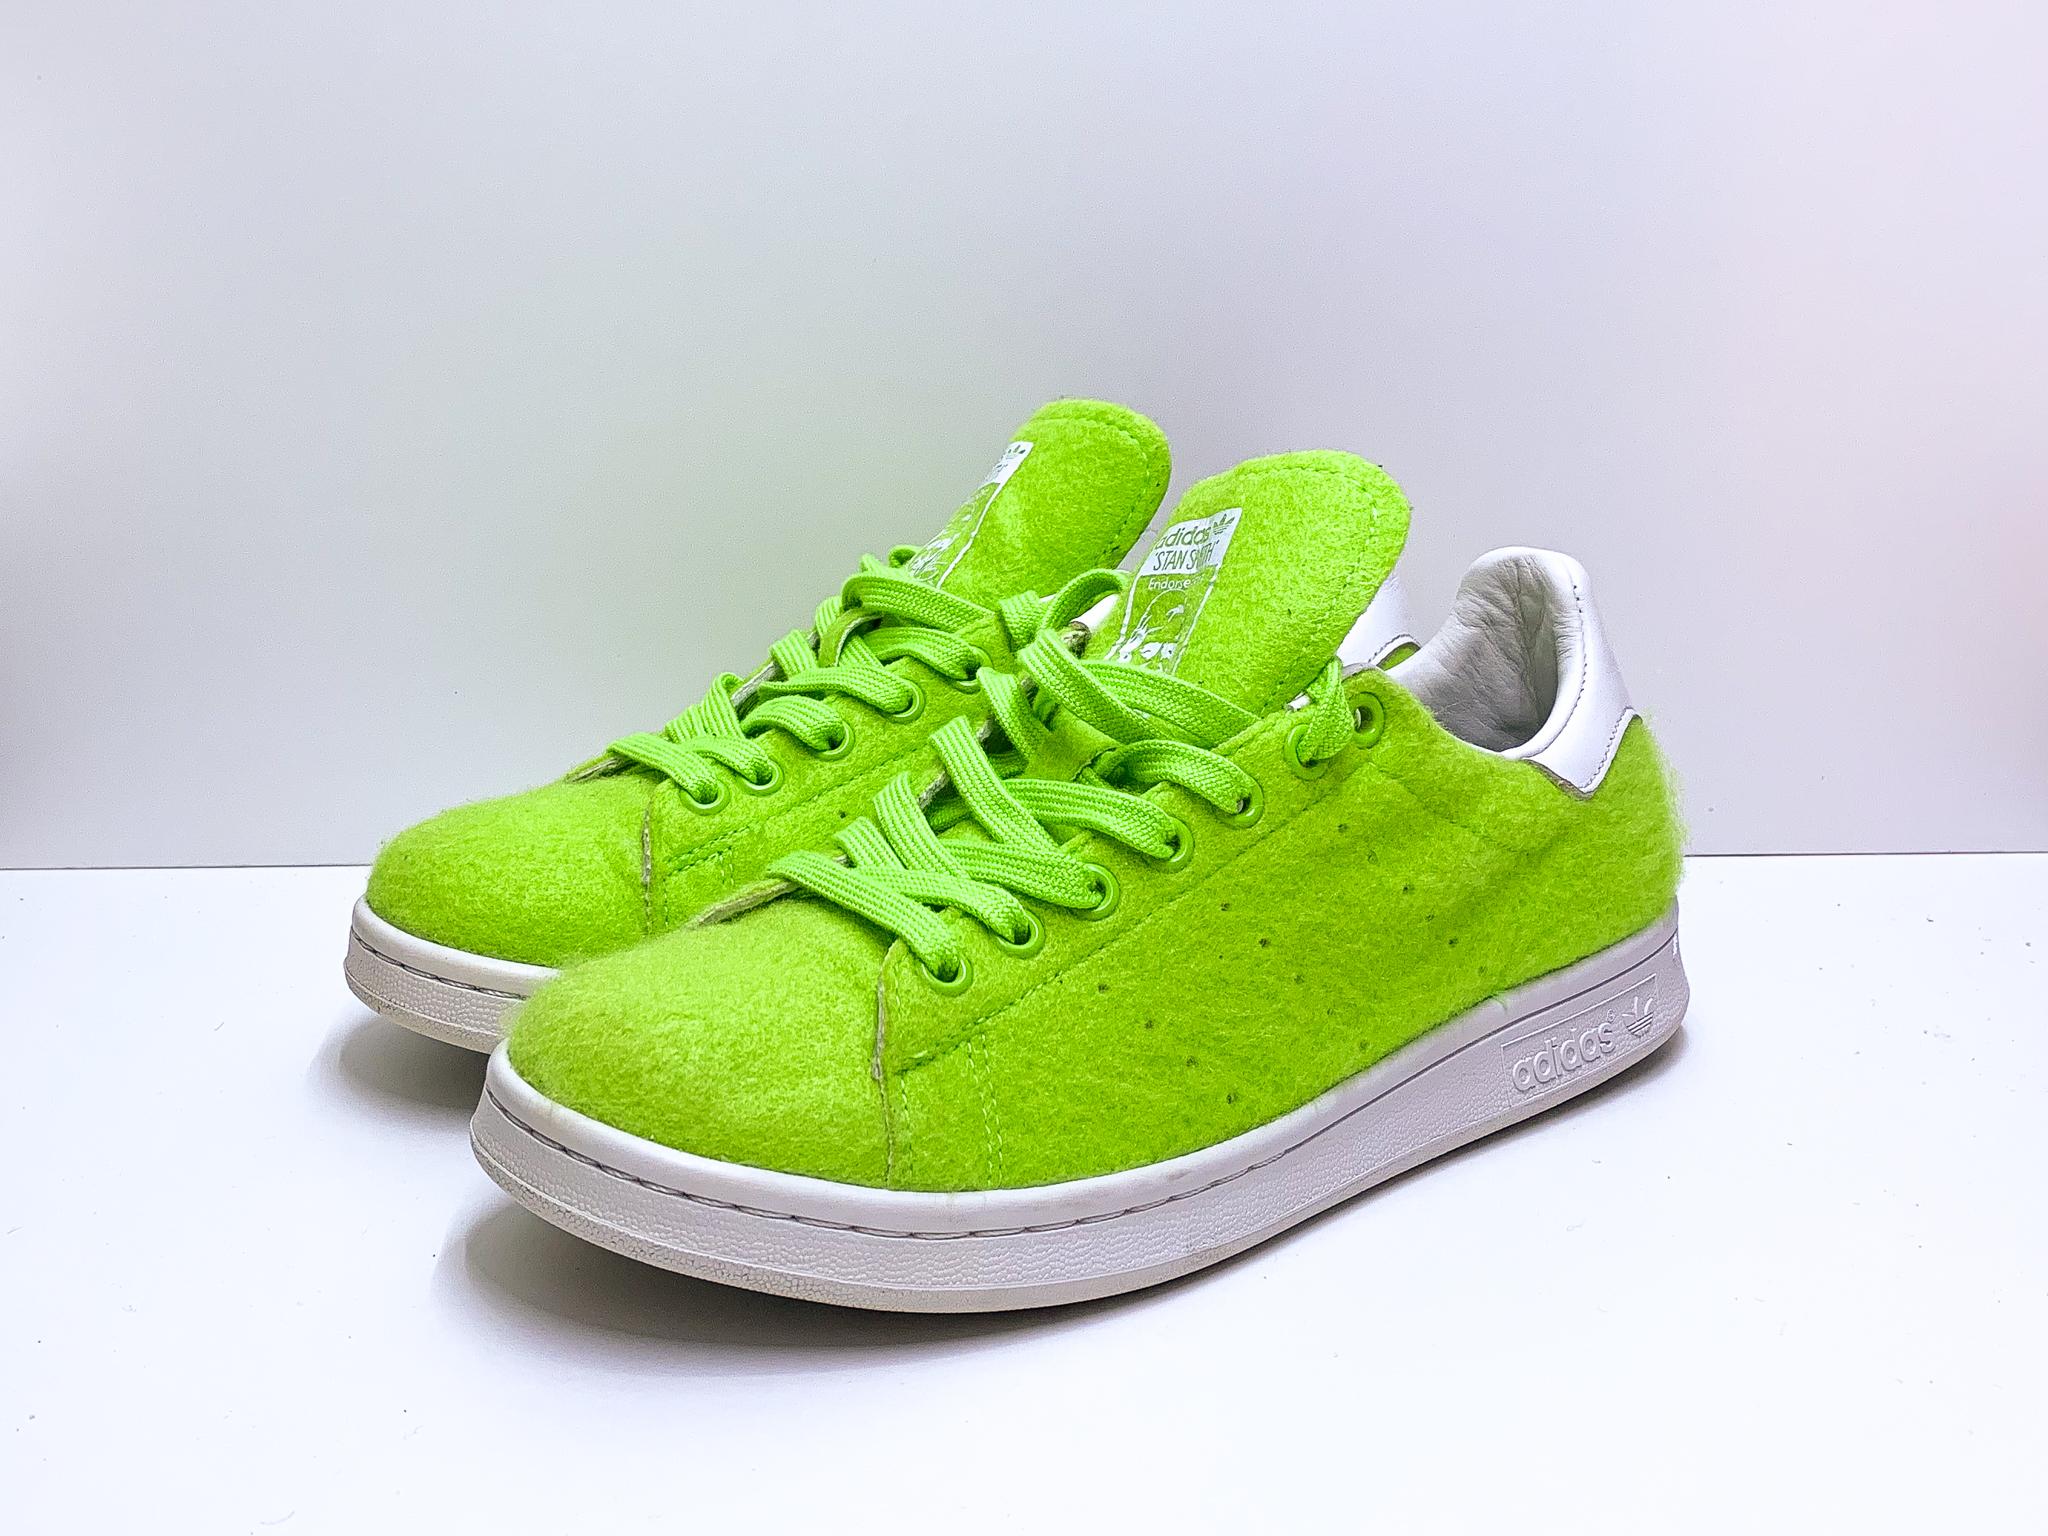 Adidas Originals x Pharrell Williams Stan Smith 'Tennis'